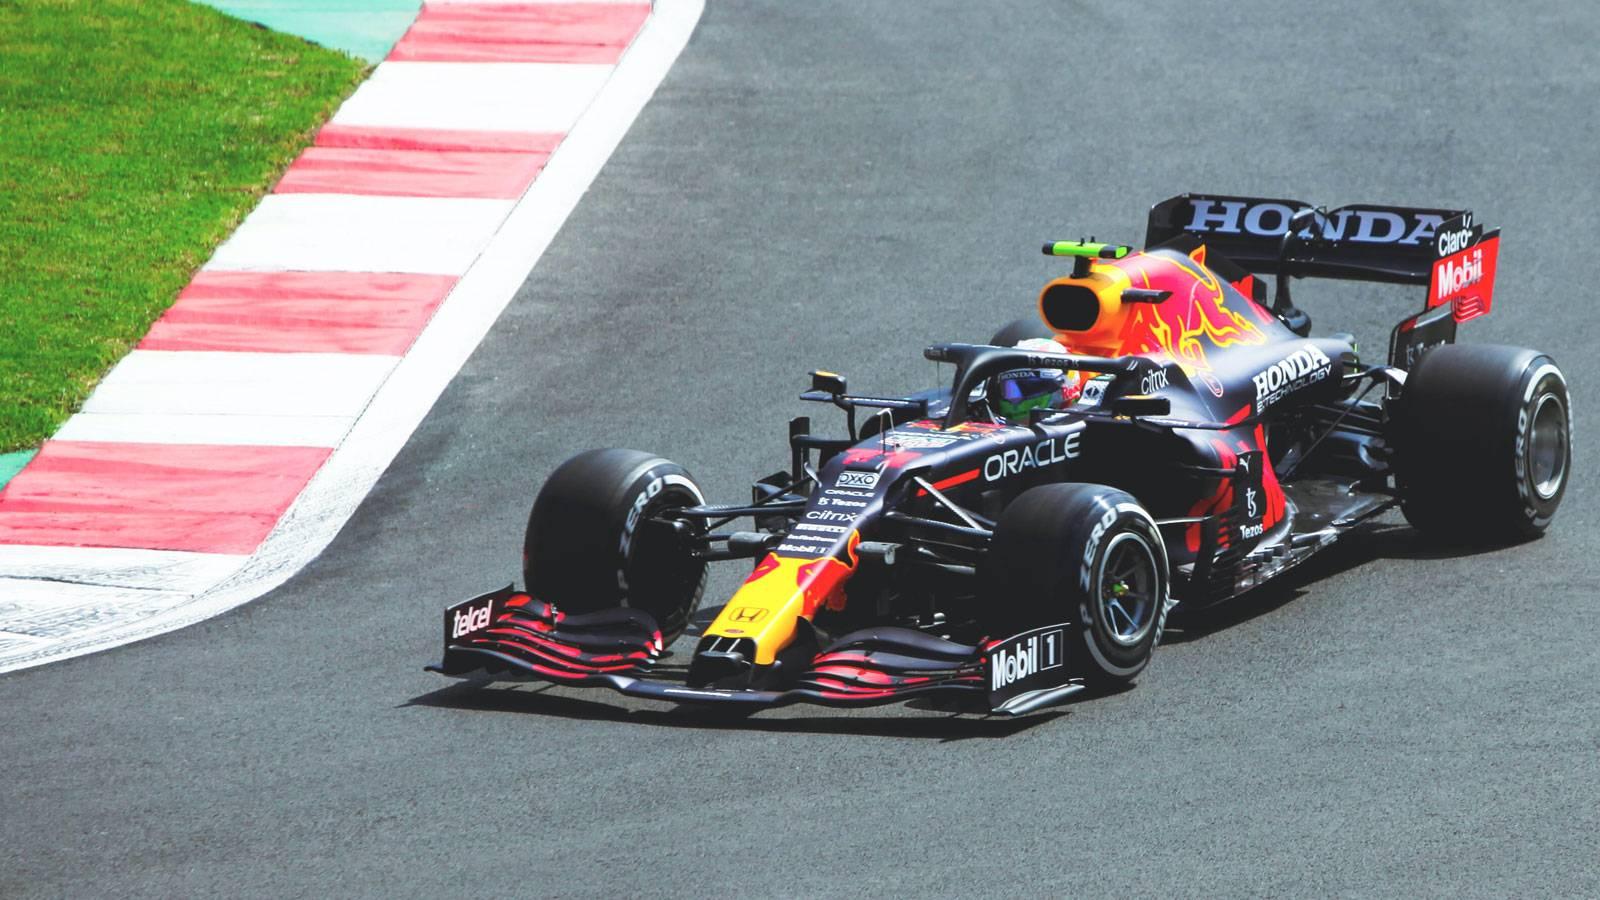 2020 US Grand Prix - 3 Day Pass (10/23 - 10/25)